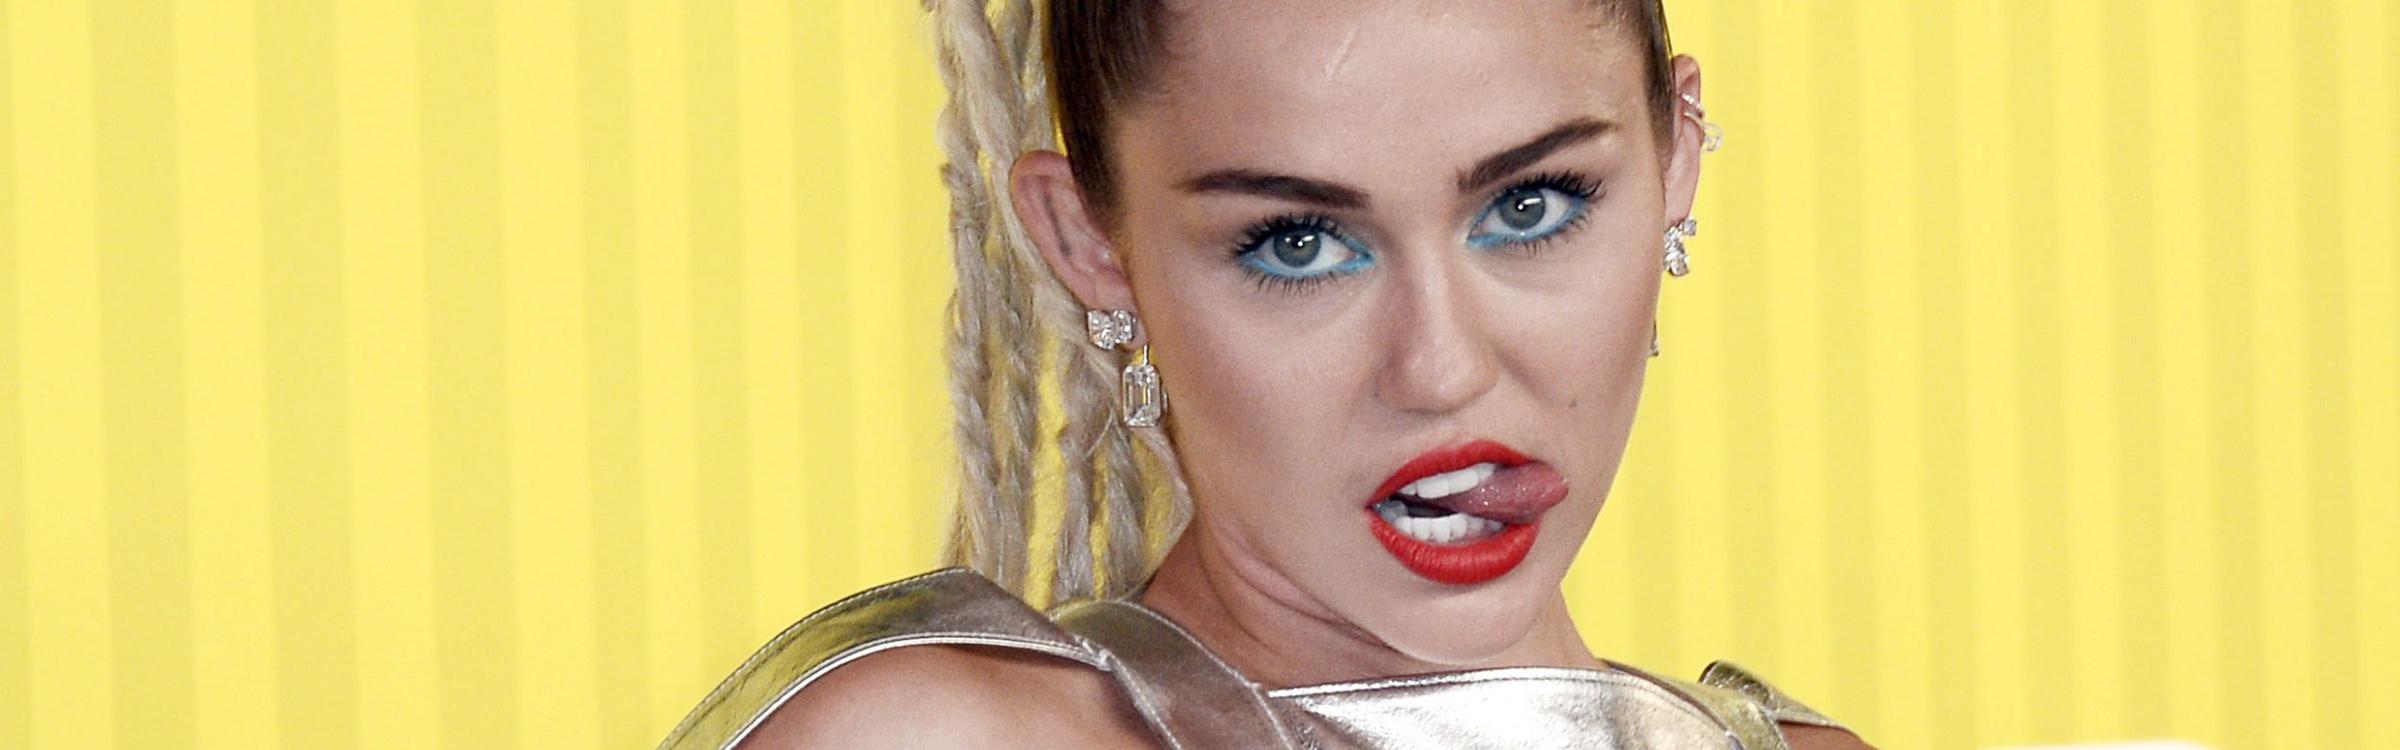 Mileycyrusheader